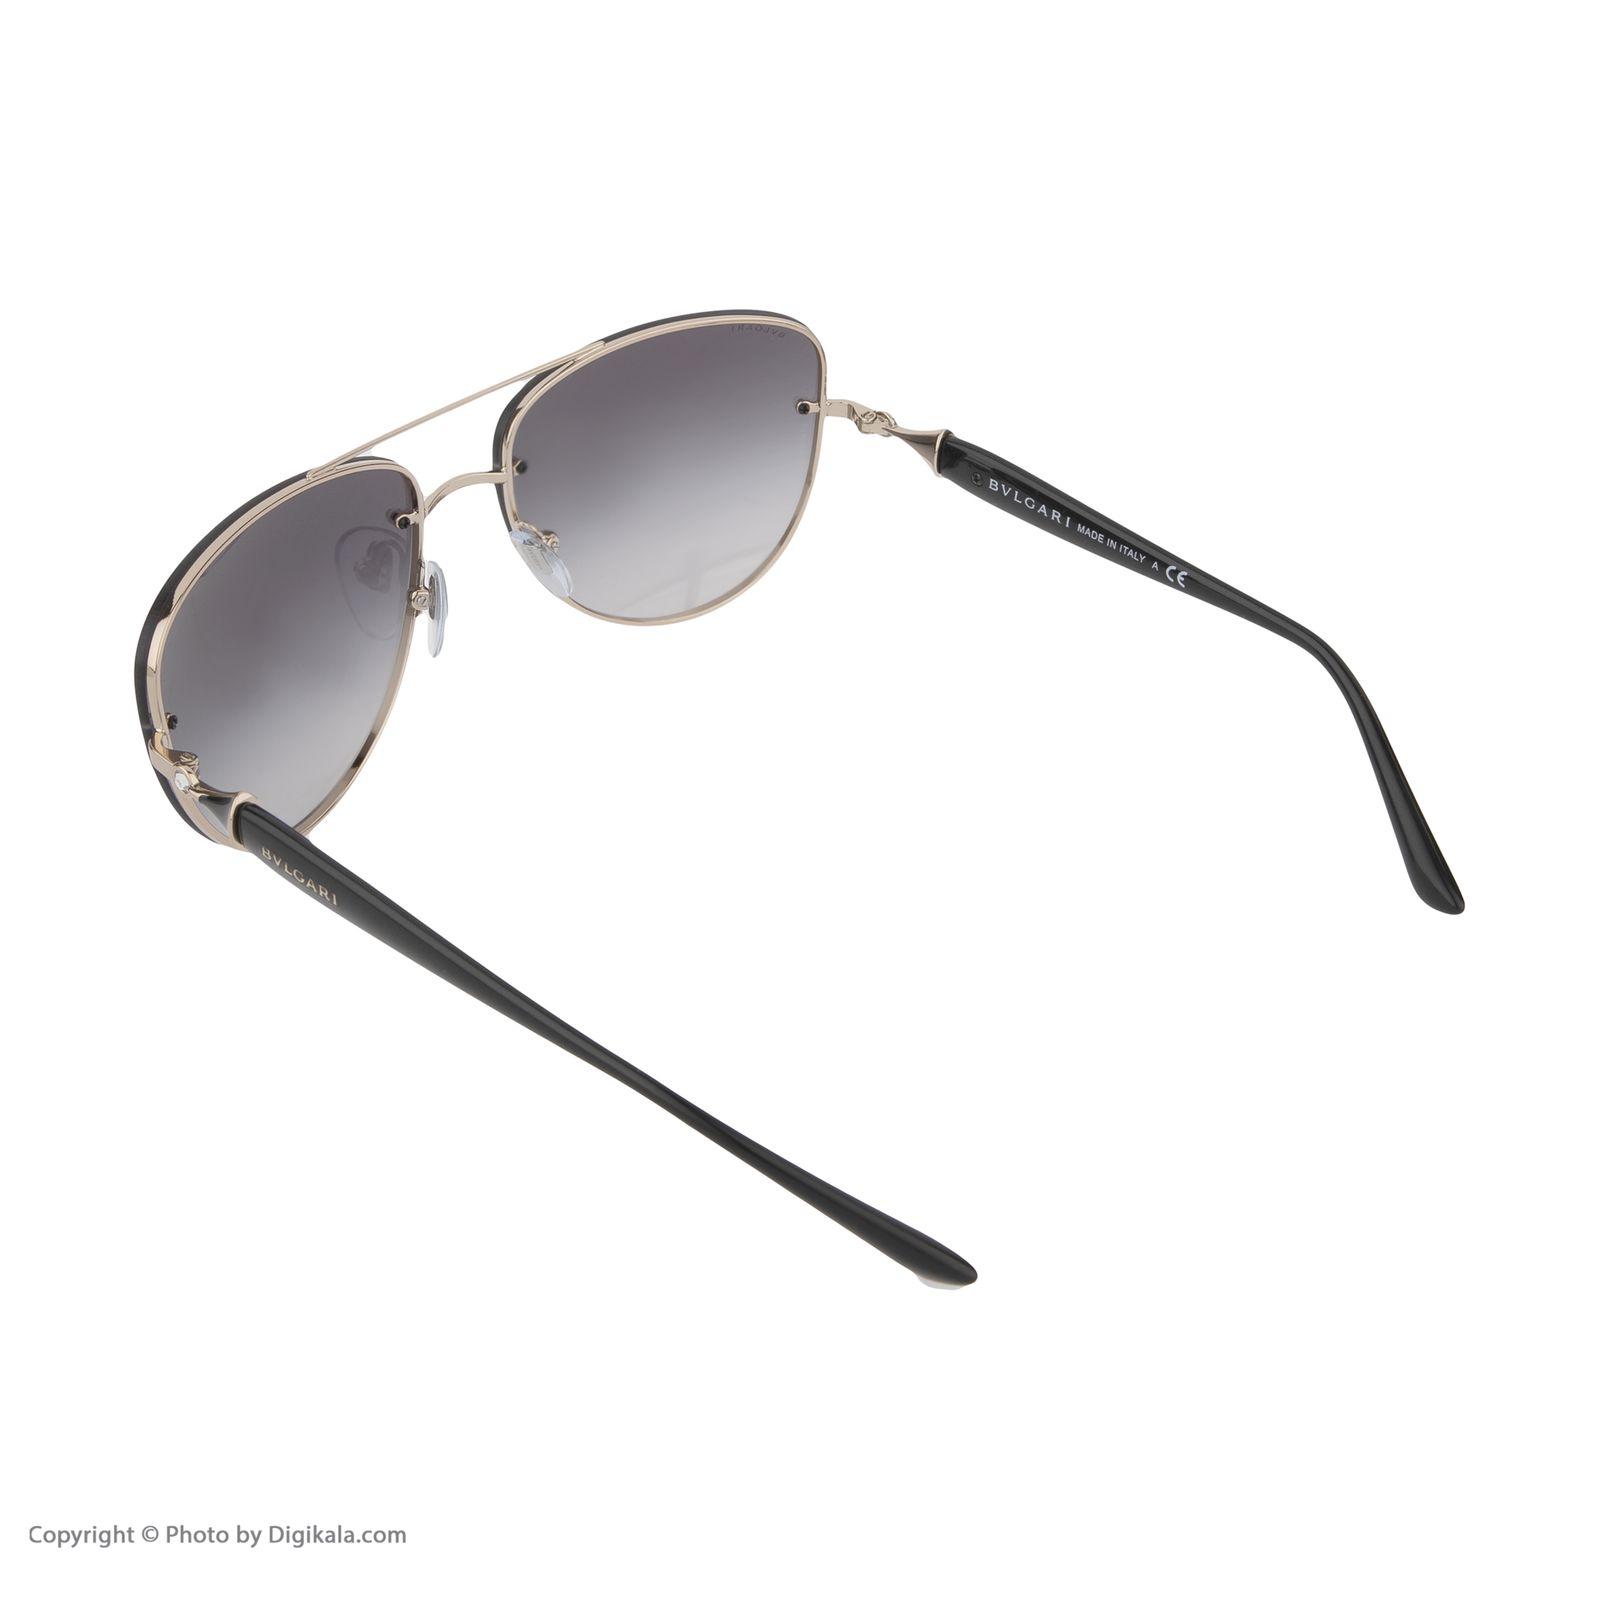 عینک آفتابی مردانه بولگاری مدل BV6086B 20148G -  - 5